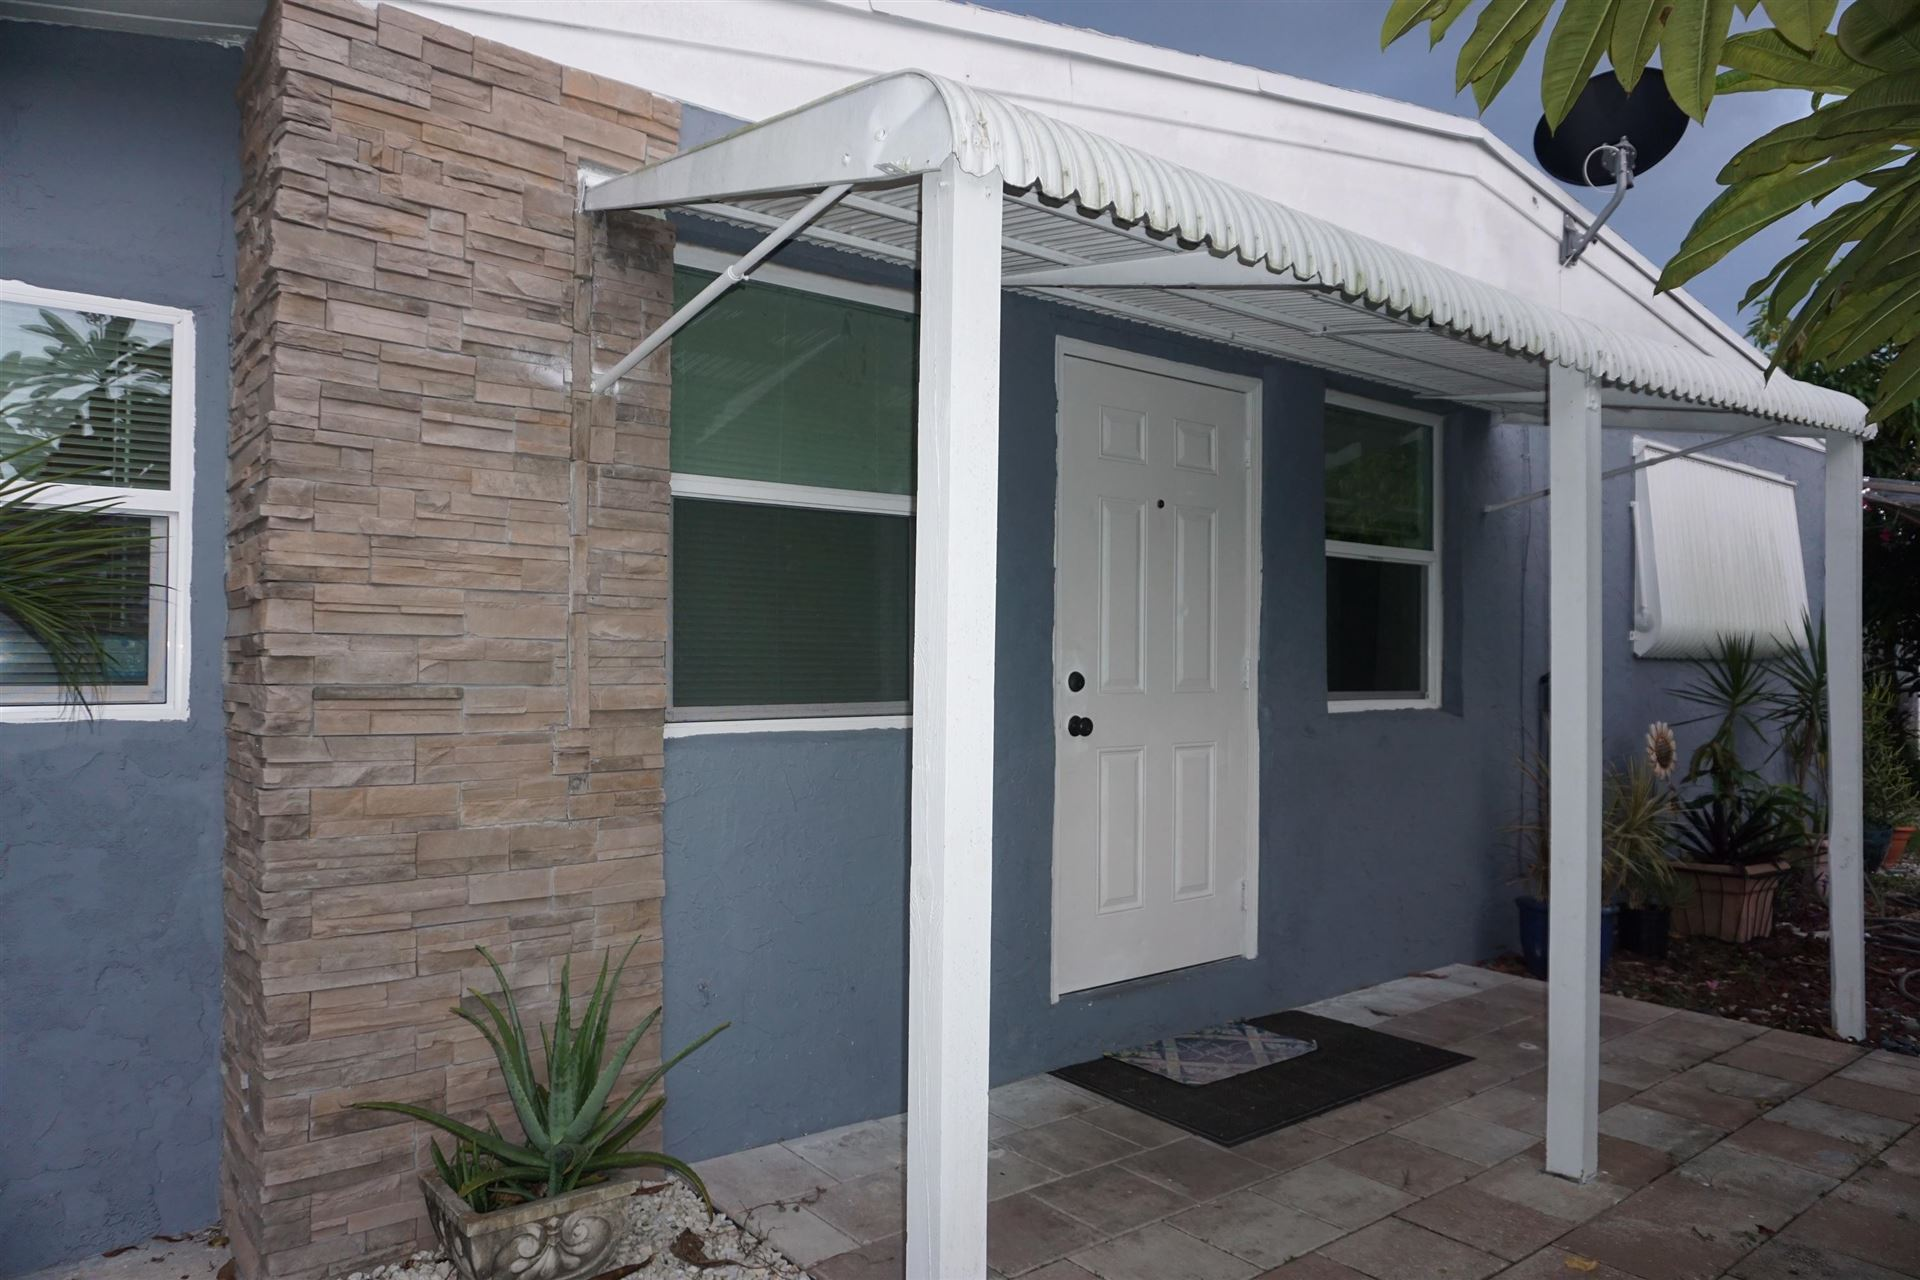 428 Shawnee Lane, Lake Worth, FL 33462 - #: RX-10656719